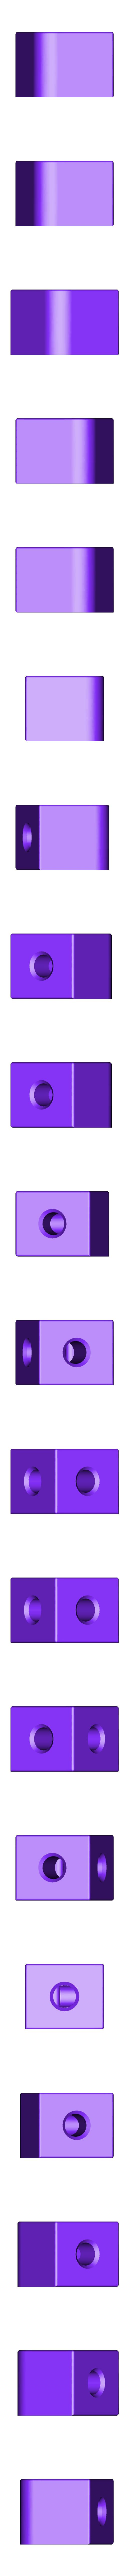 Cube.stl Download free STL file CREALITY 3D Printer Enclosure • Model to 3D print, Uavmax